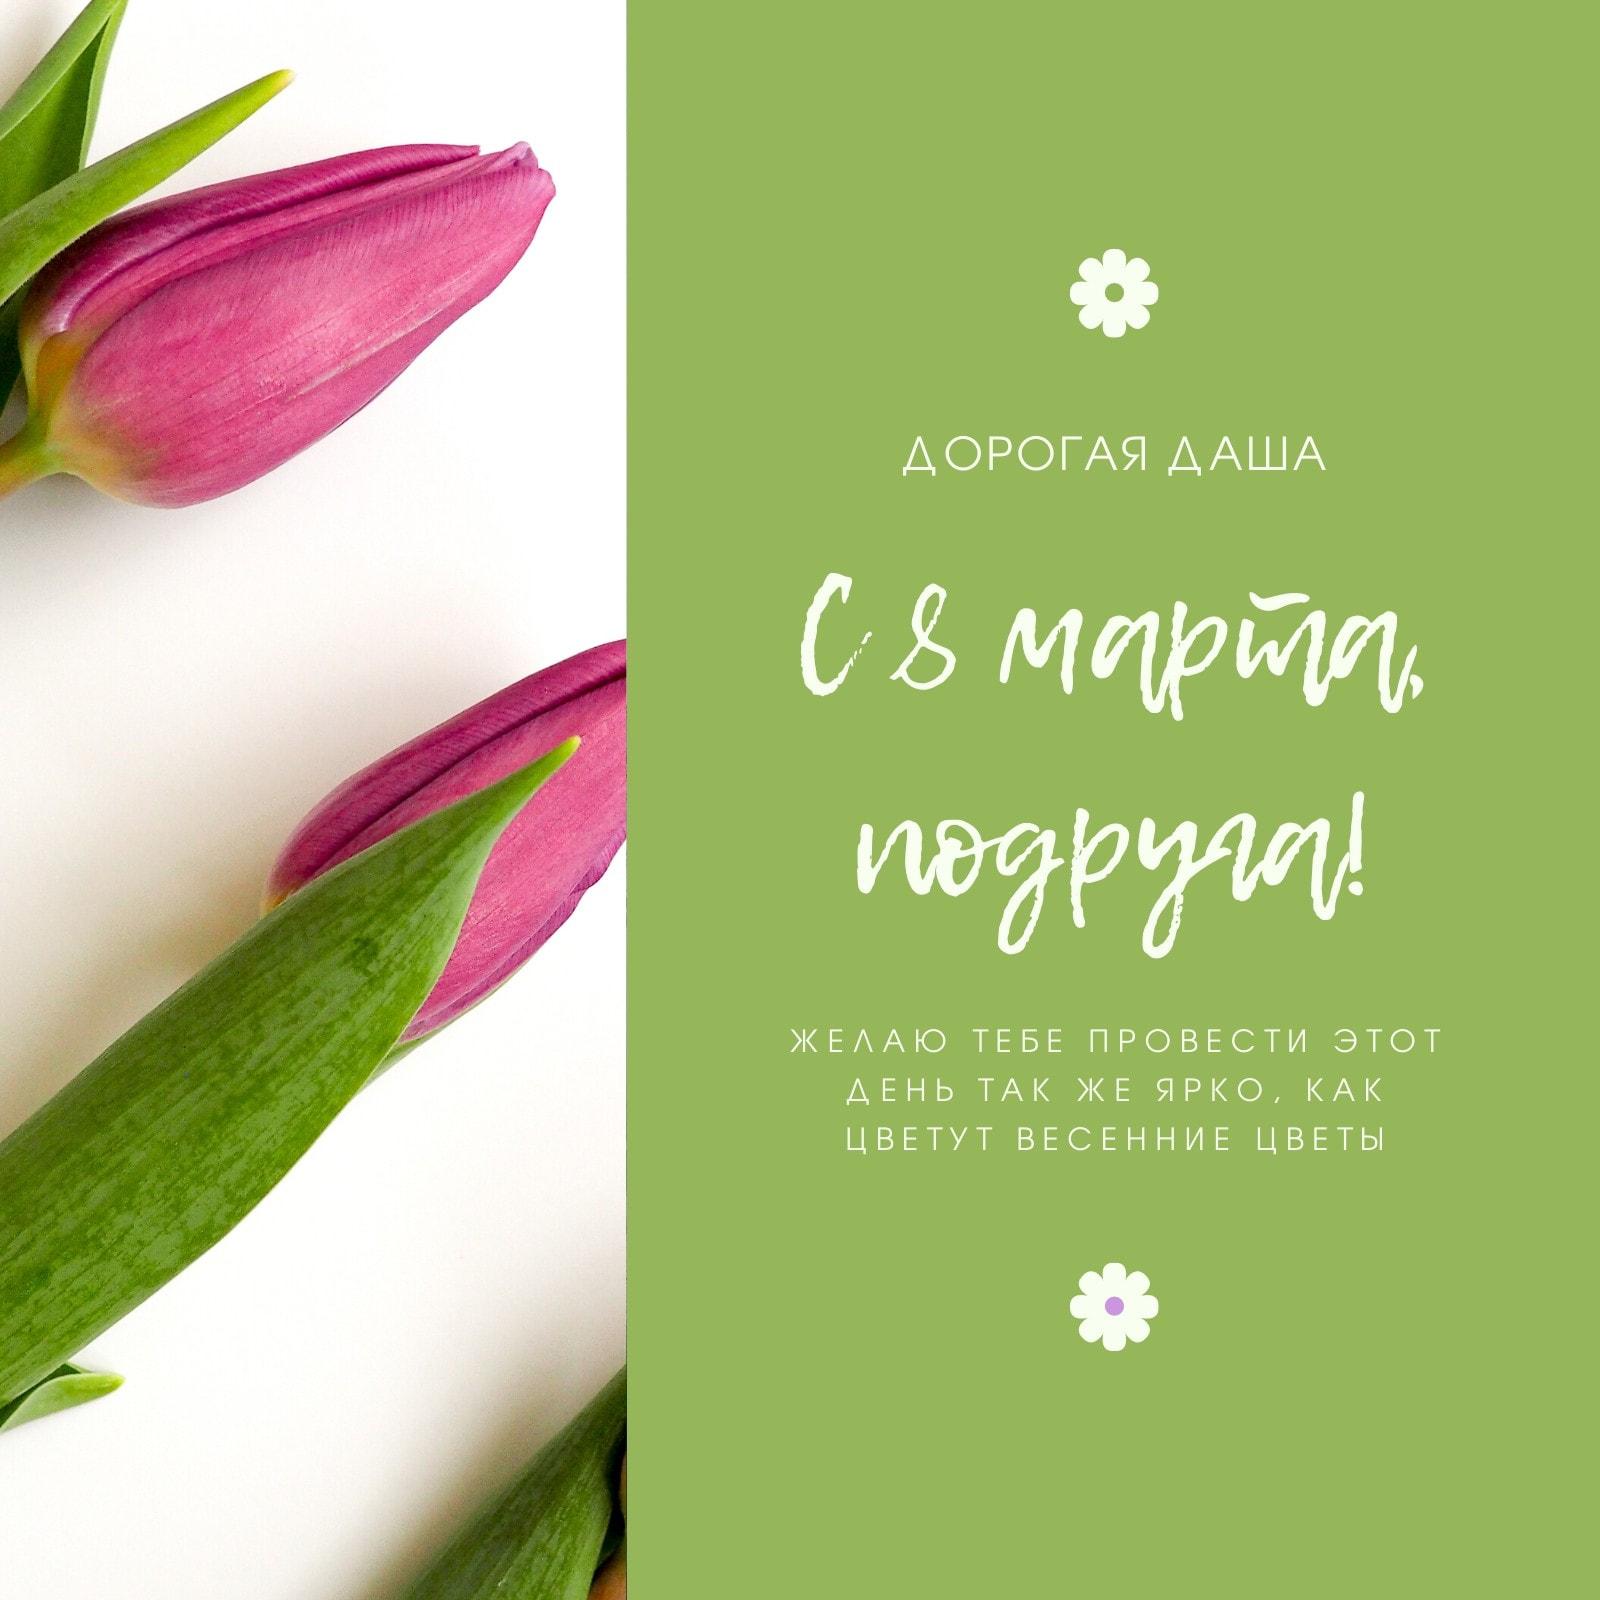 Зеленый Цветы Восьмое Марта Instagram Публикация